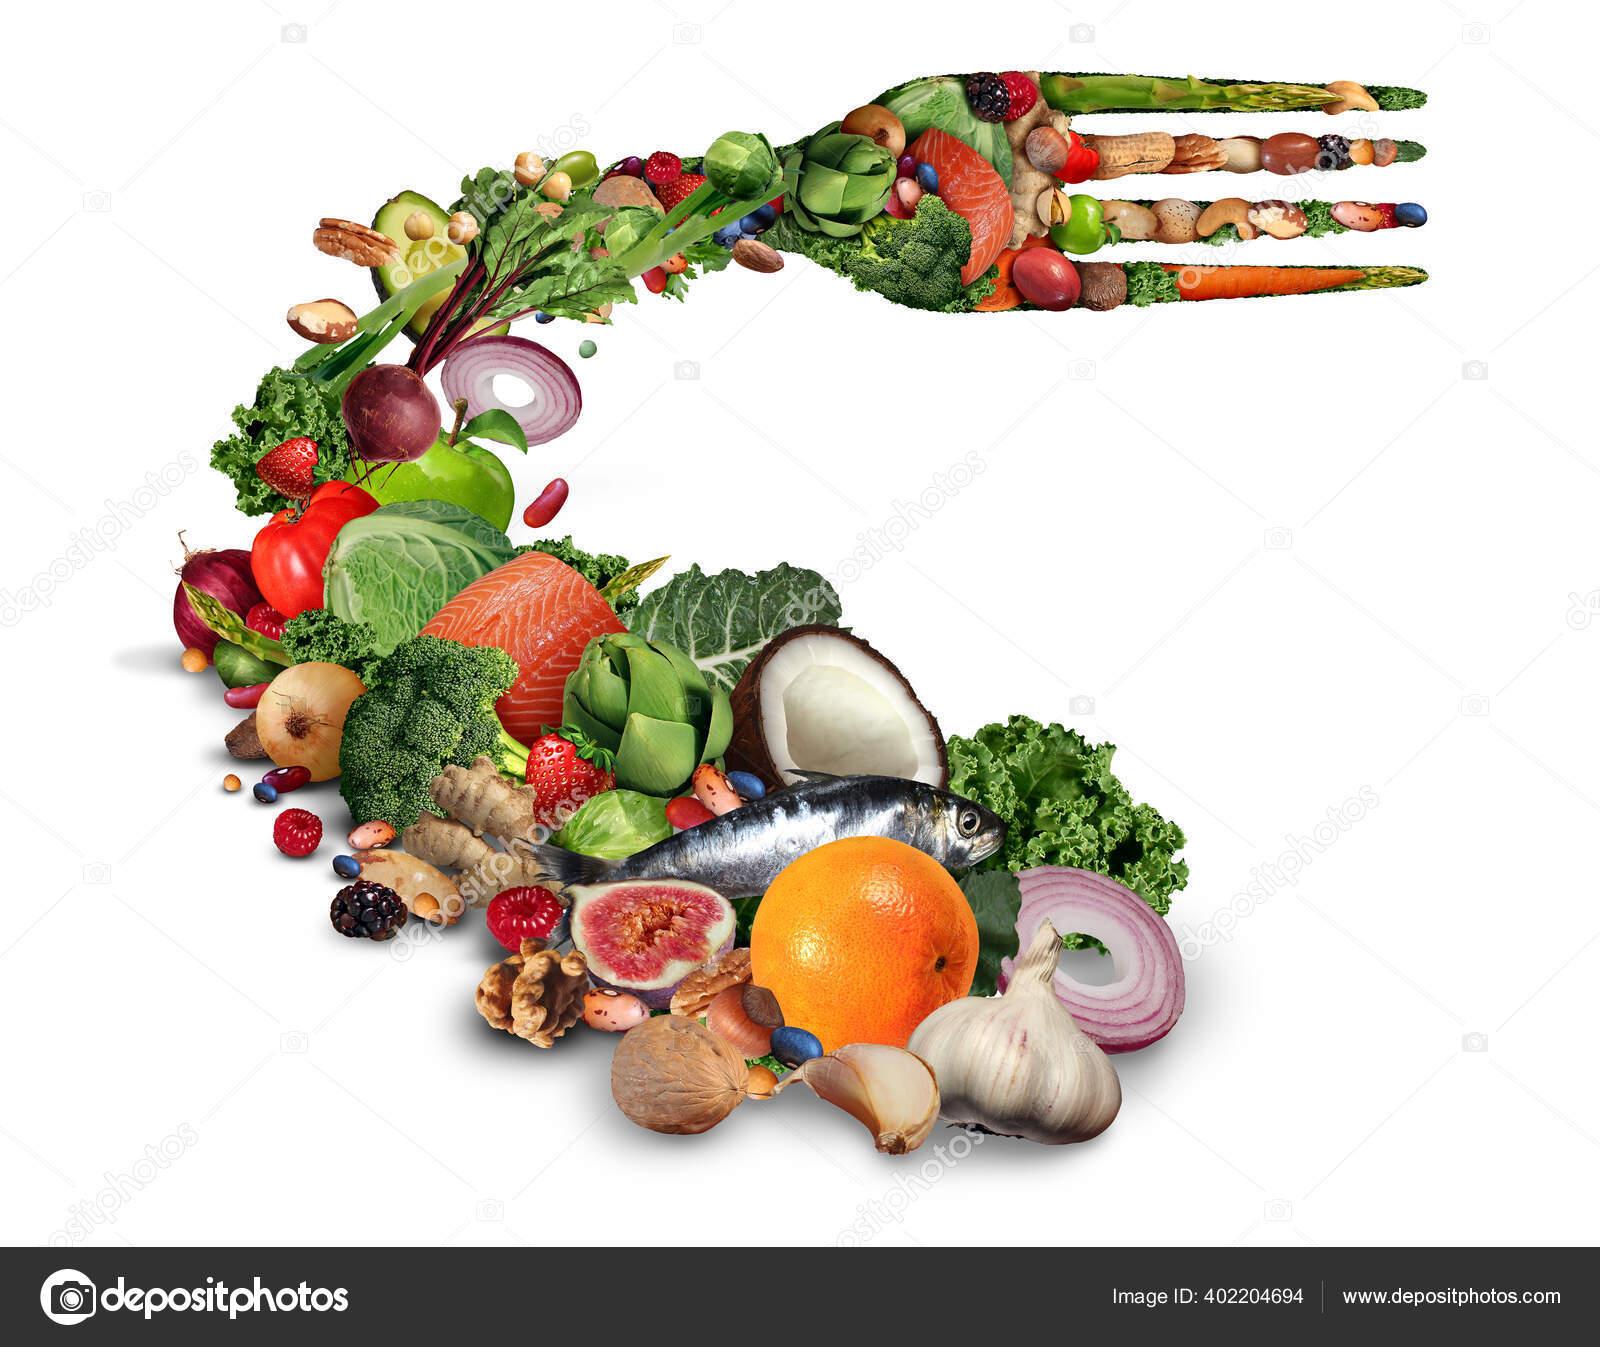 Nutrition - CDC